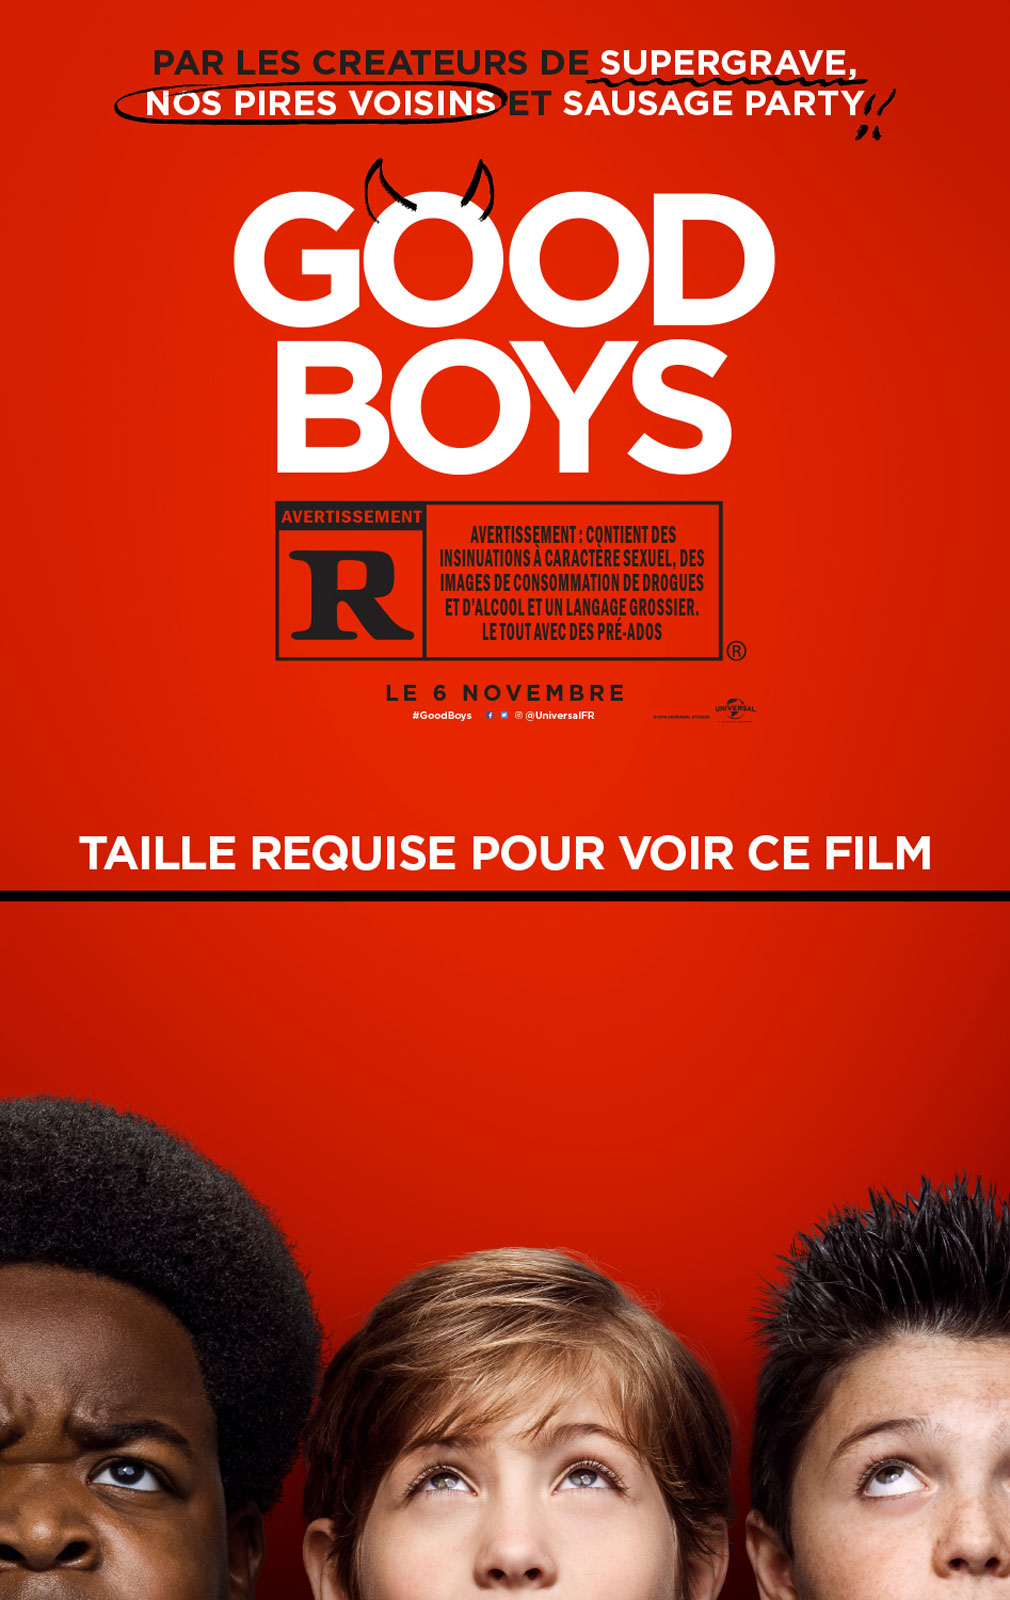 Image du film Good Boys